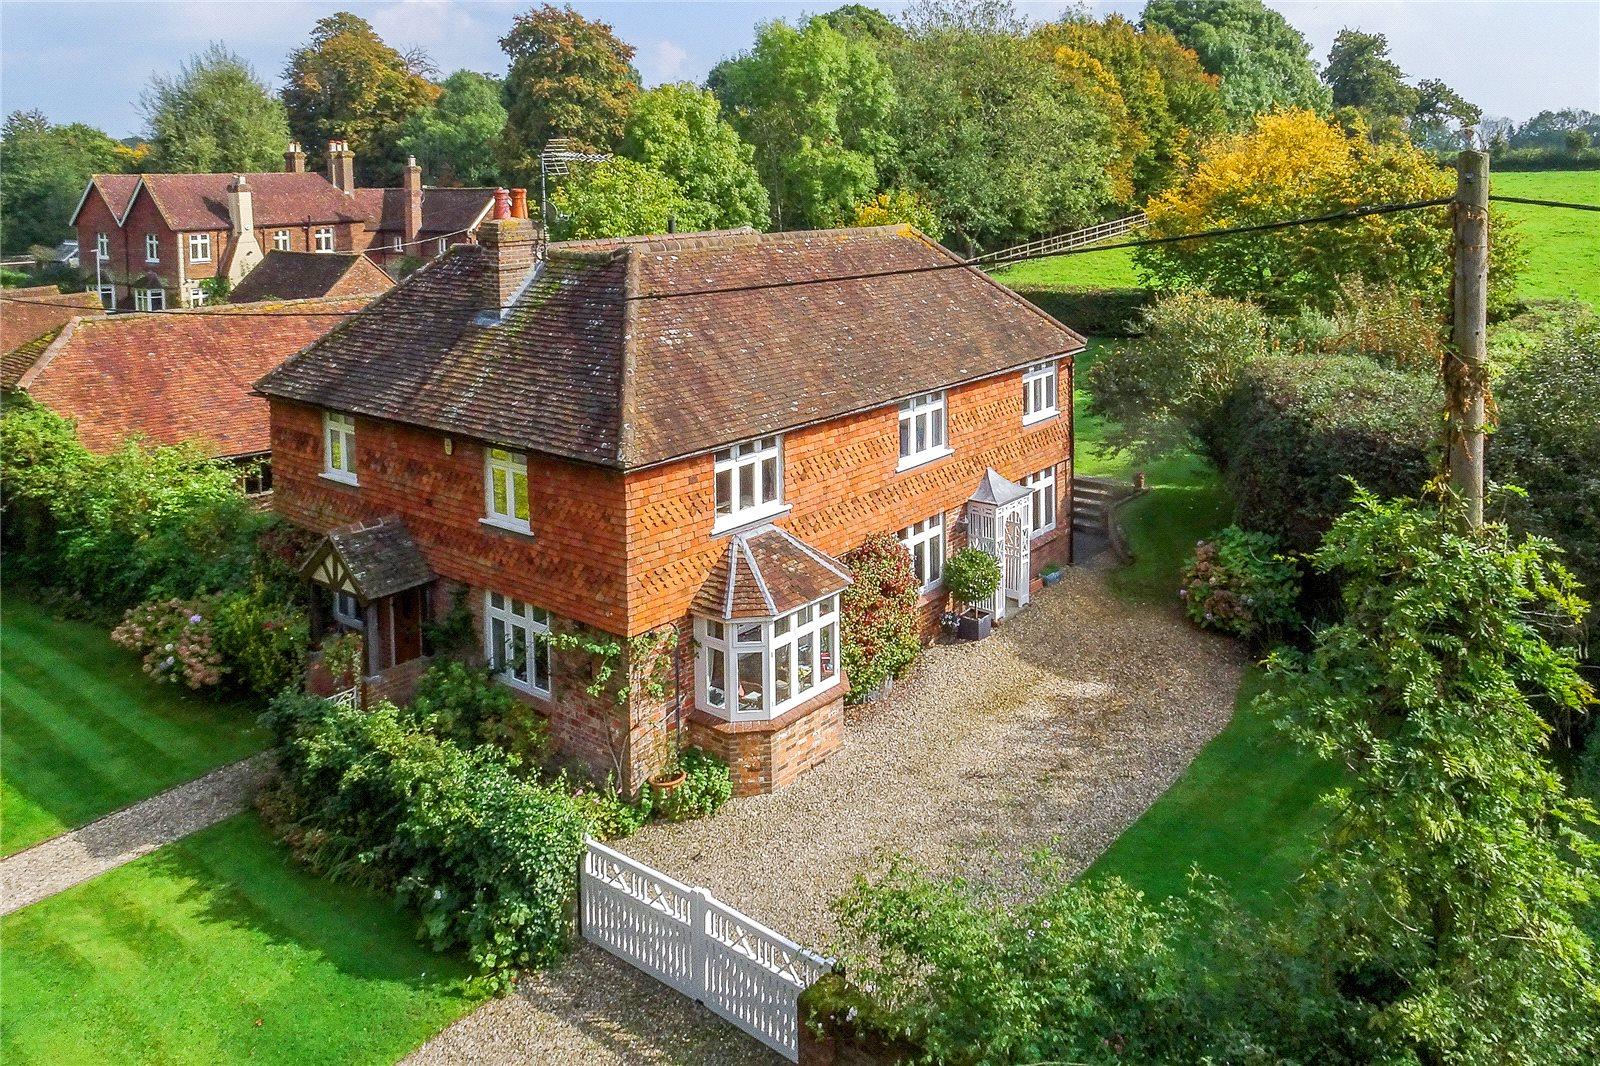 Maison unifamiliale pour l Vente à Pockford Road, Chiddingfold, Godalming, Surrey, GU8 Godalming, Angleterre